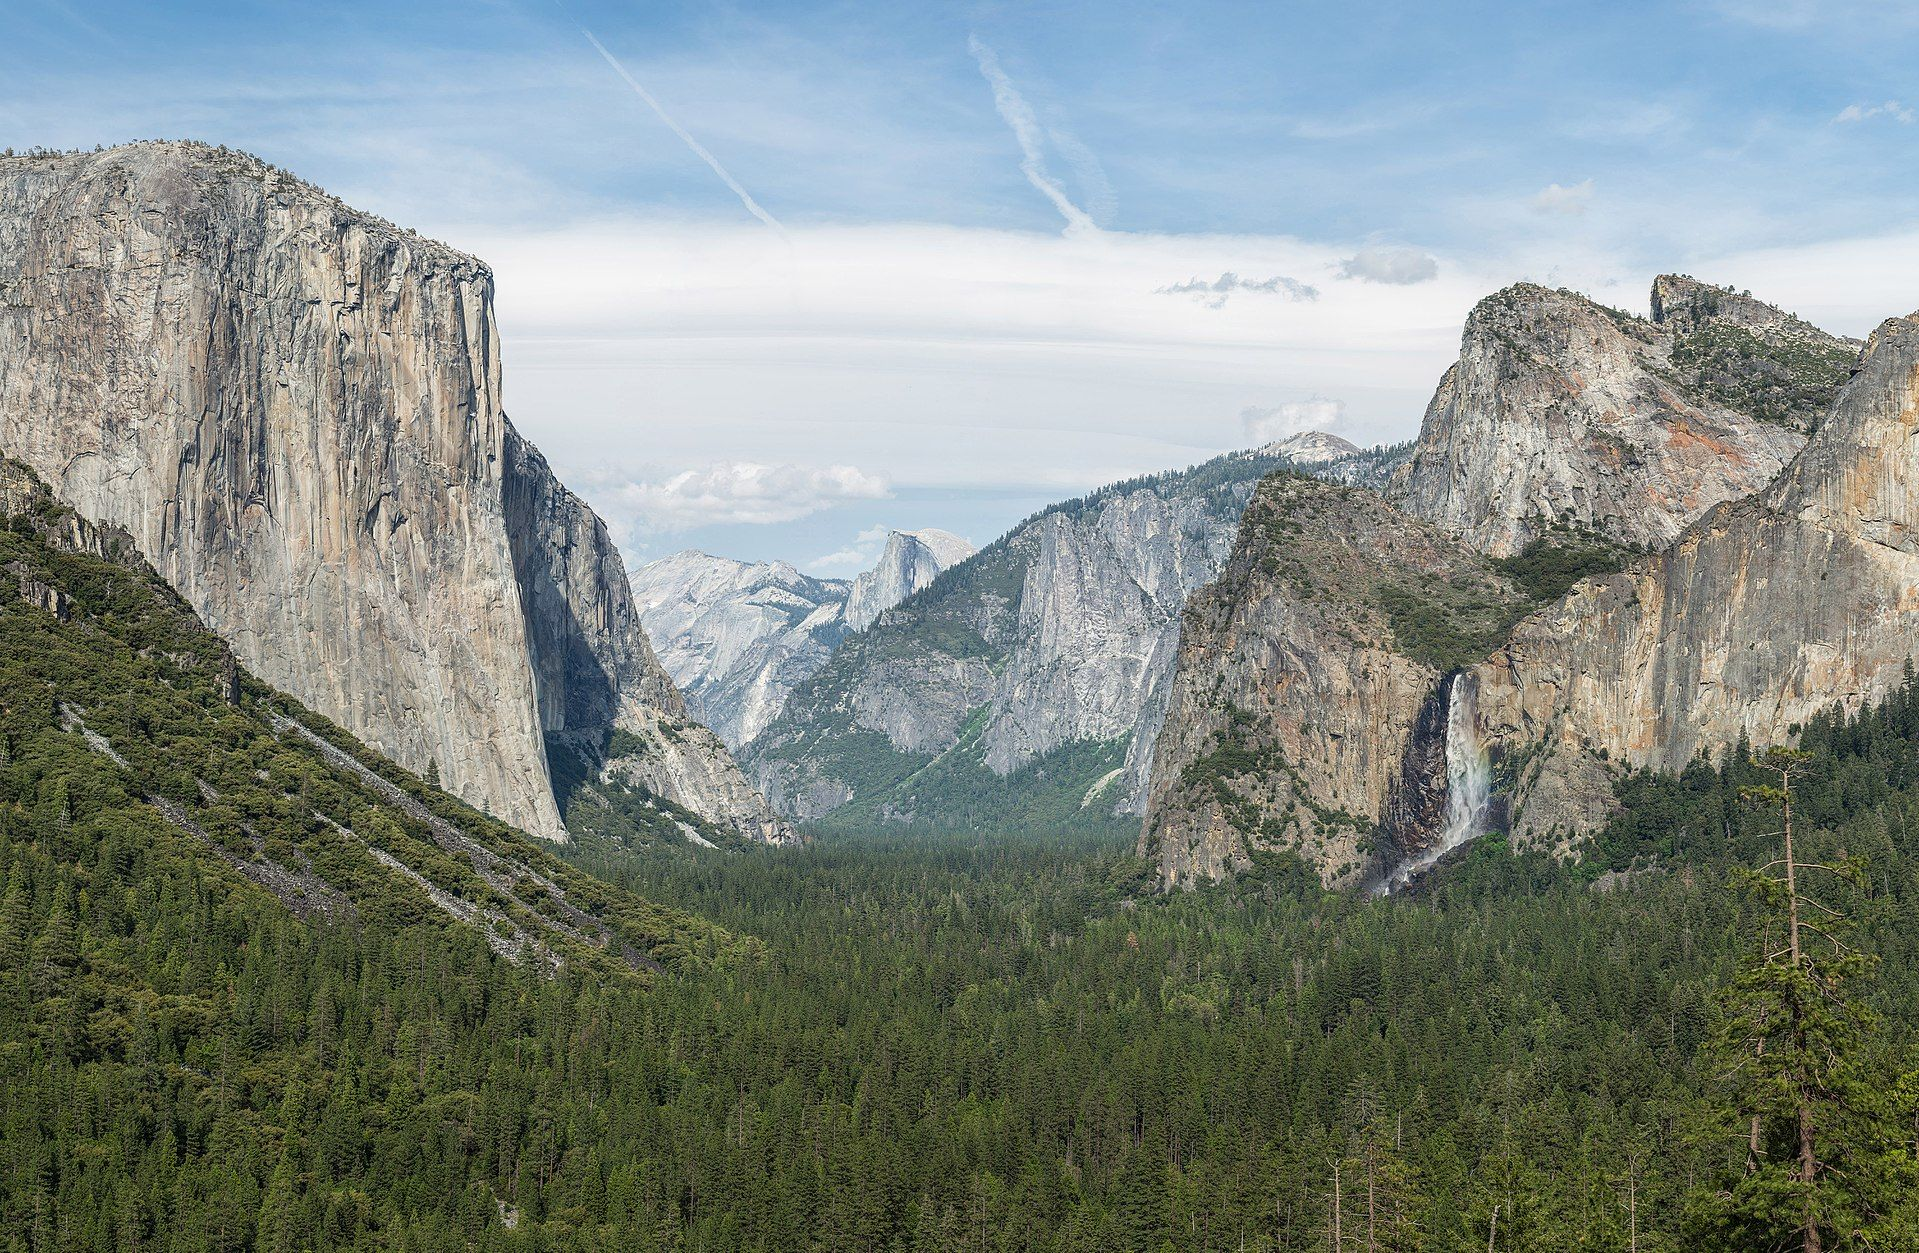 Tunnel View, Yosemite Valley, Yosemite NP Diliff